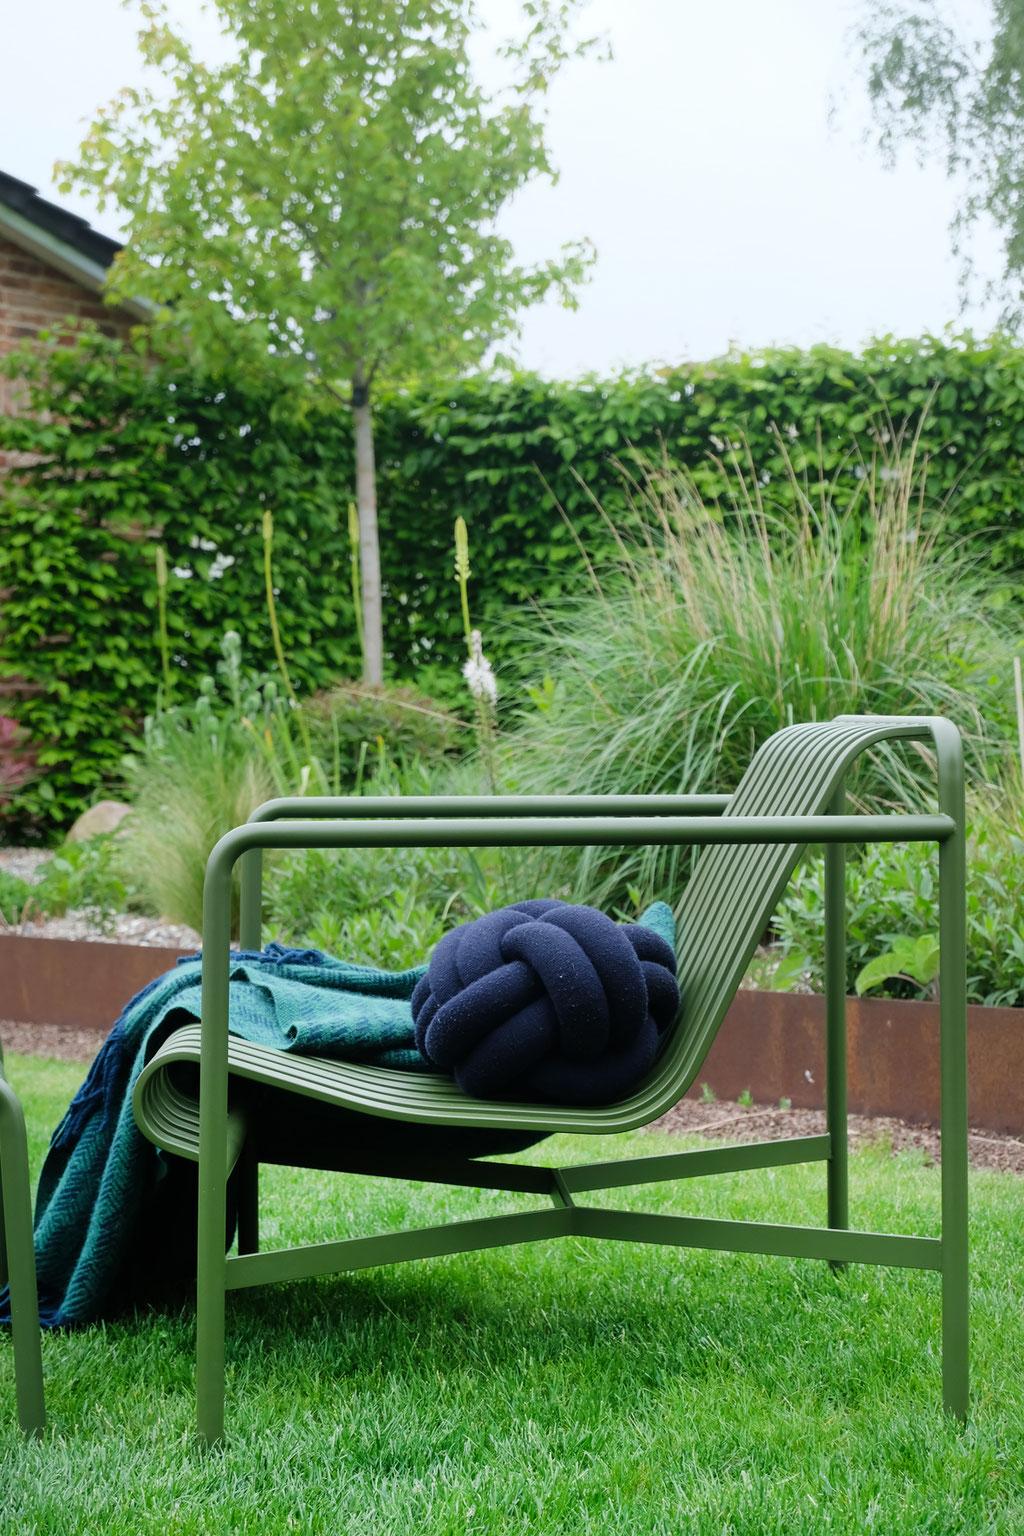 dieartigeGARTEN - Garten-Lounge-Sessel Palissade in Olive von Hay + Knot-Kissen + Klippan-Wolldecke